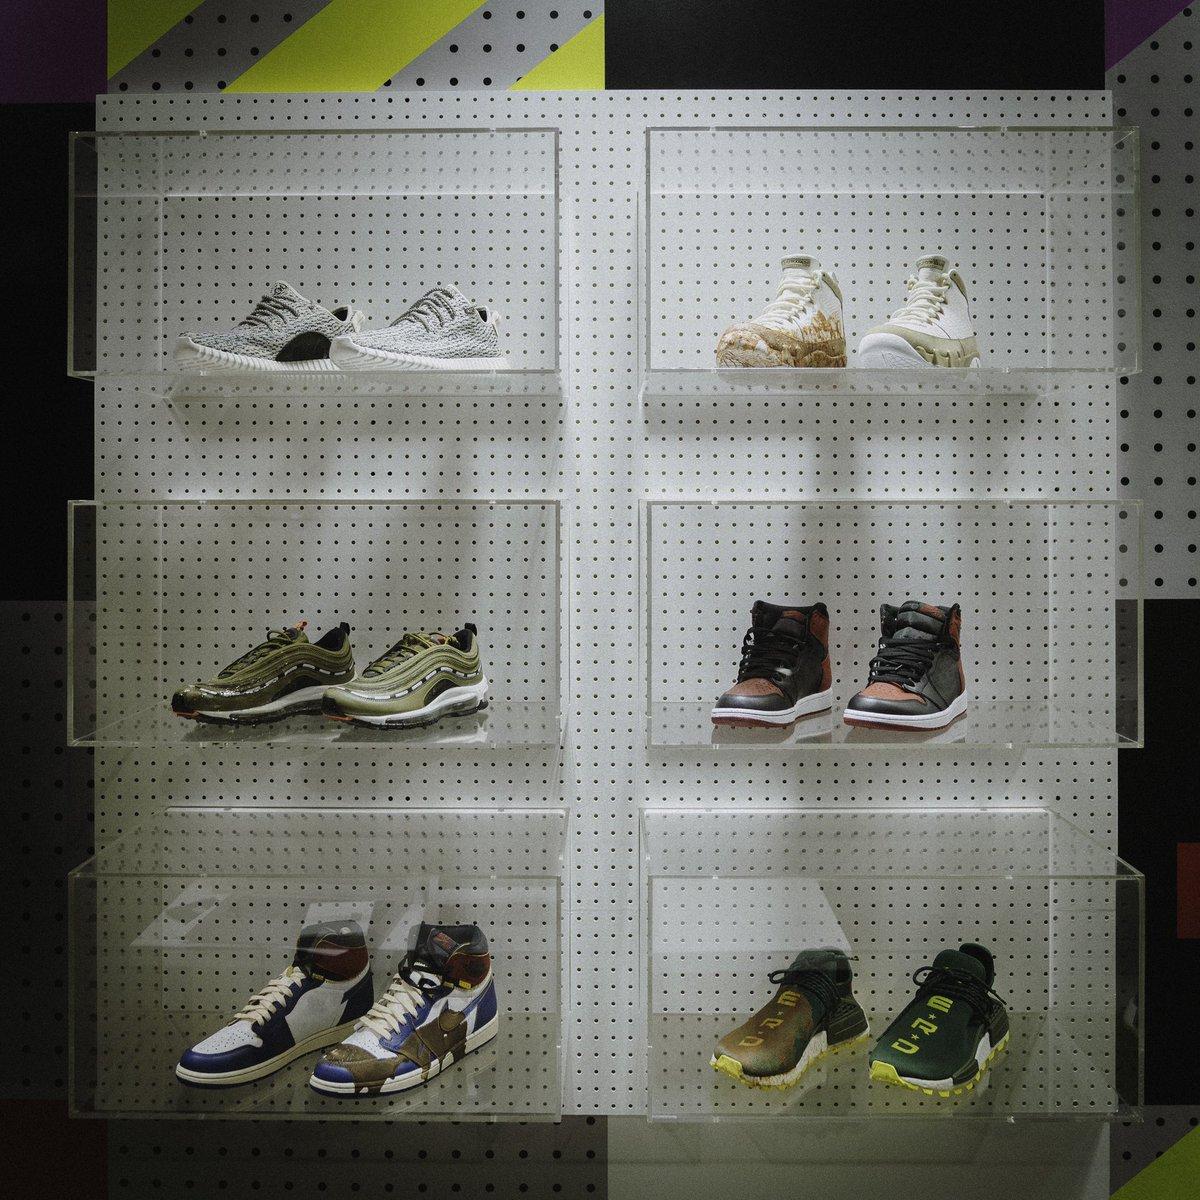 shoe cleaning shop near me